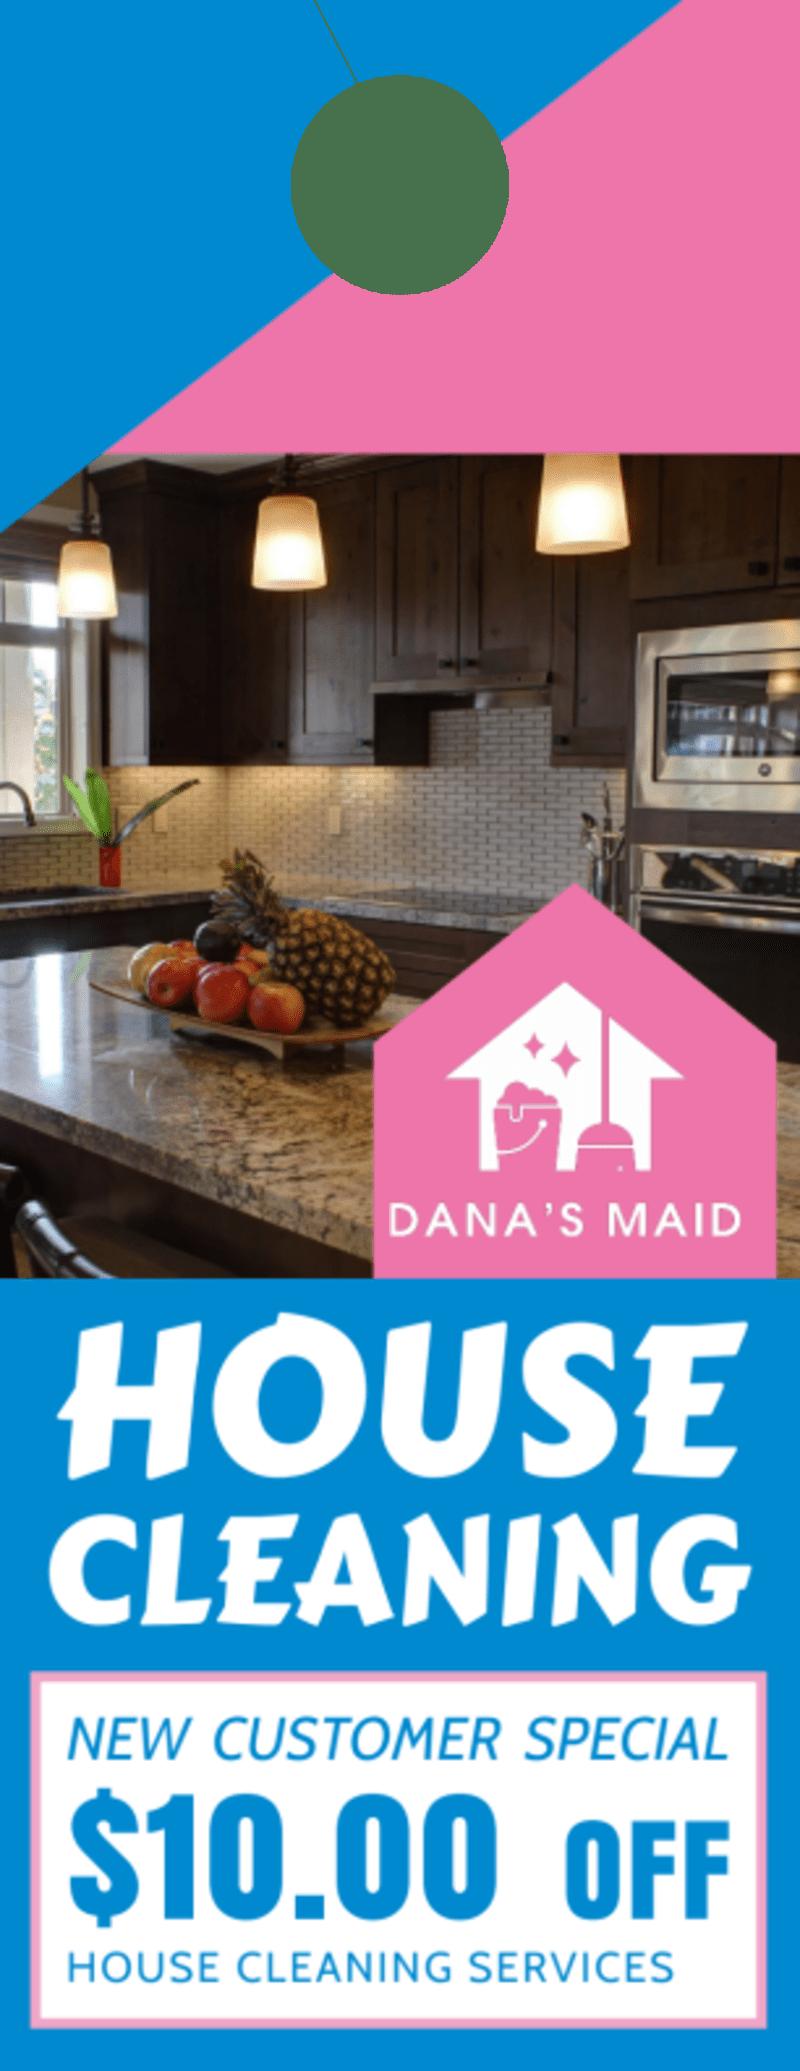 House Cleaning Door Hanger Template Preview 2